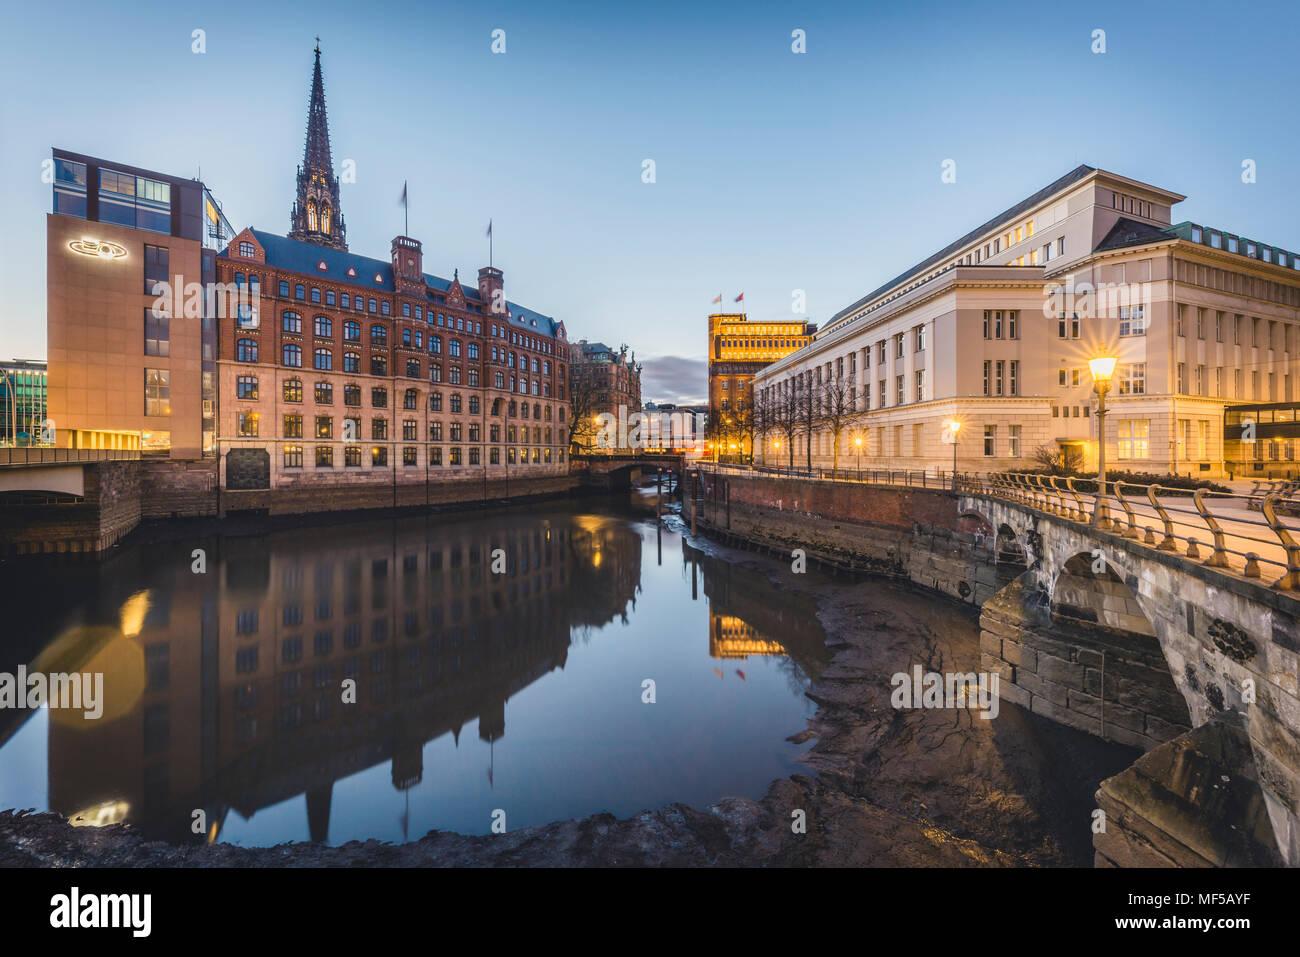 Germany, Hamburg, Hamburg, Hamburg-Altstadt, Nikolai Fleet, Stock Exchange and house of 'Patriotische Gesellschaft' Stock Photo